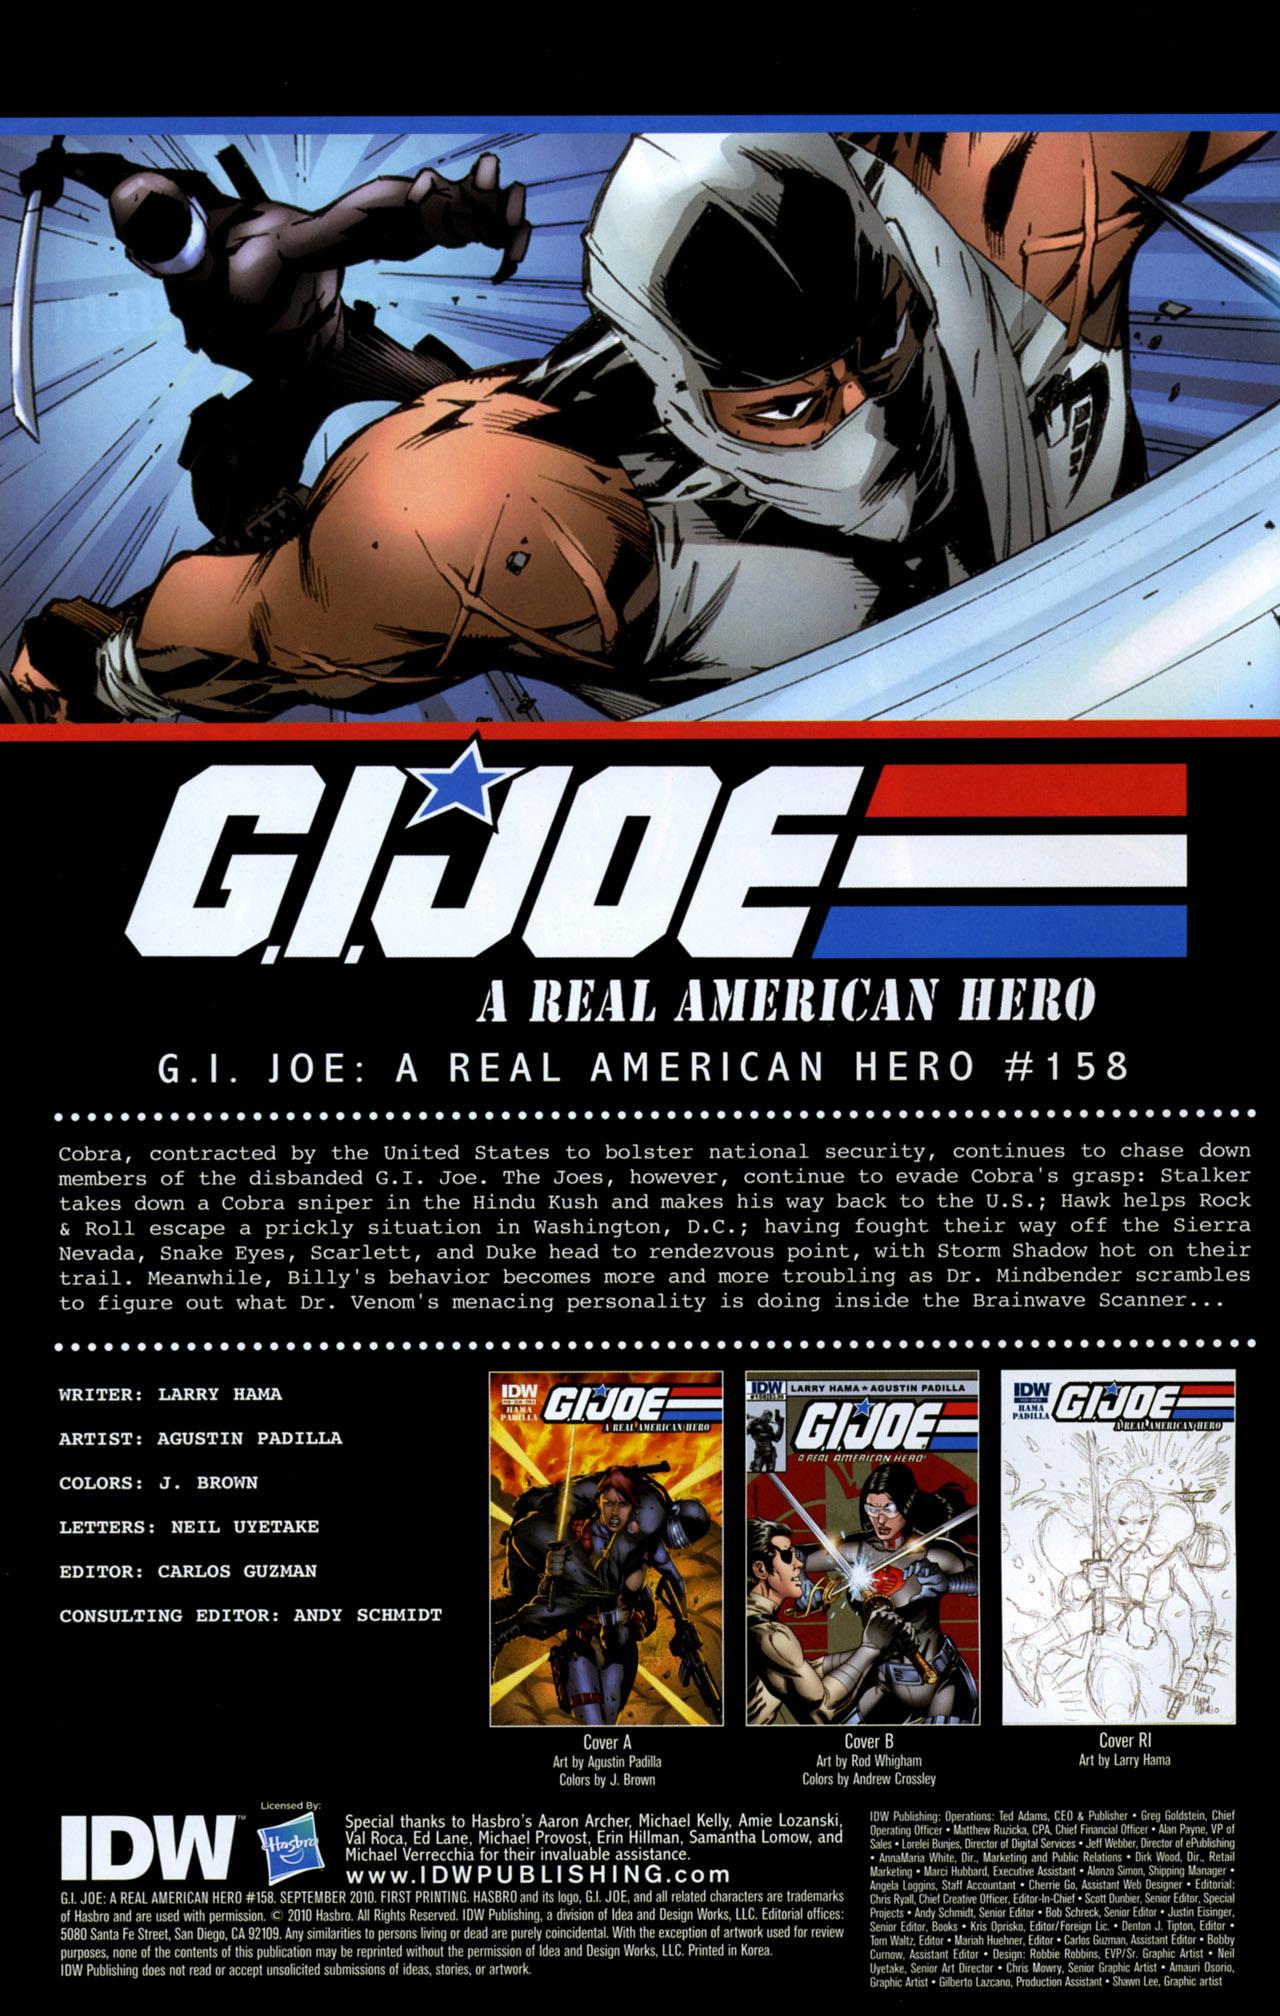 G.I. Joe: A Real American Hero 158 Page 1